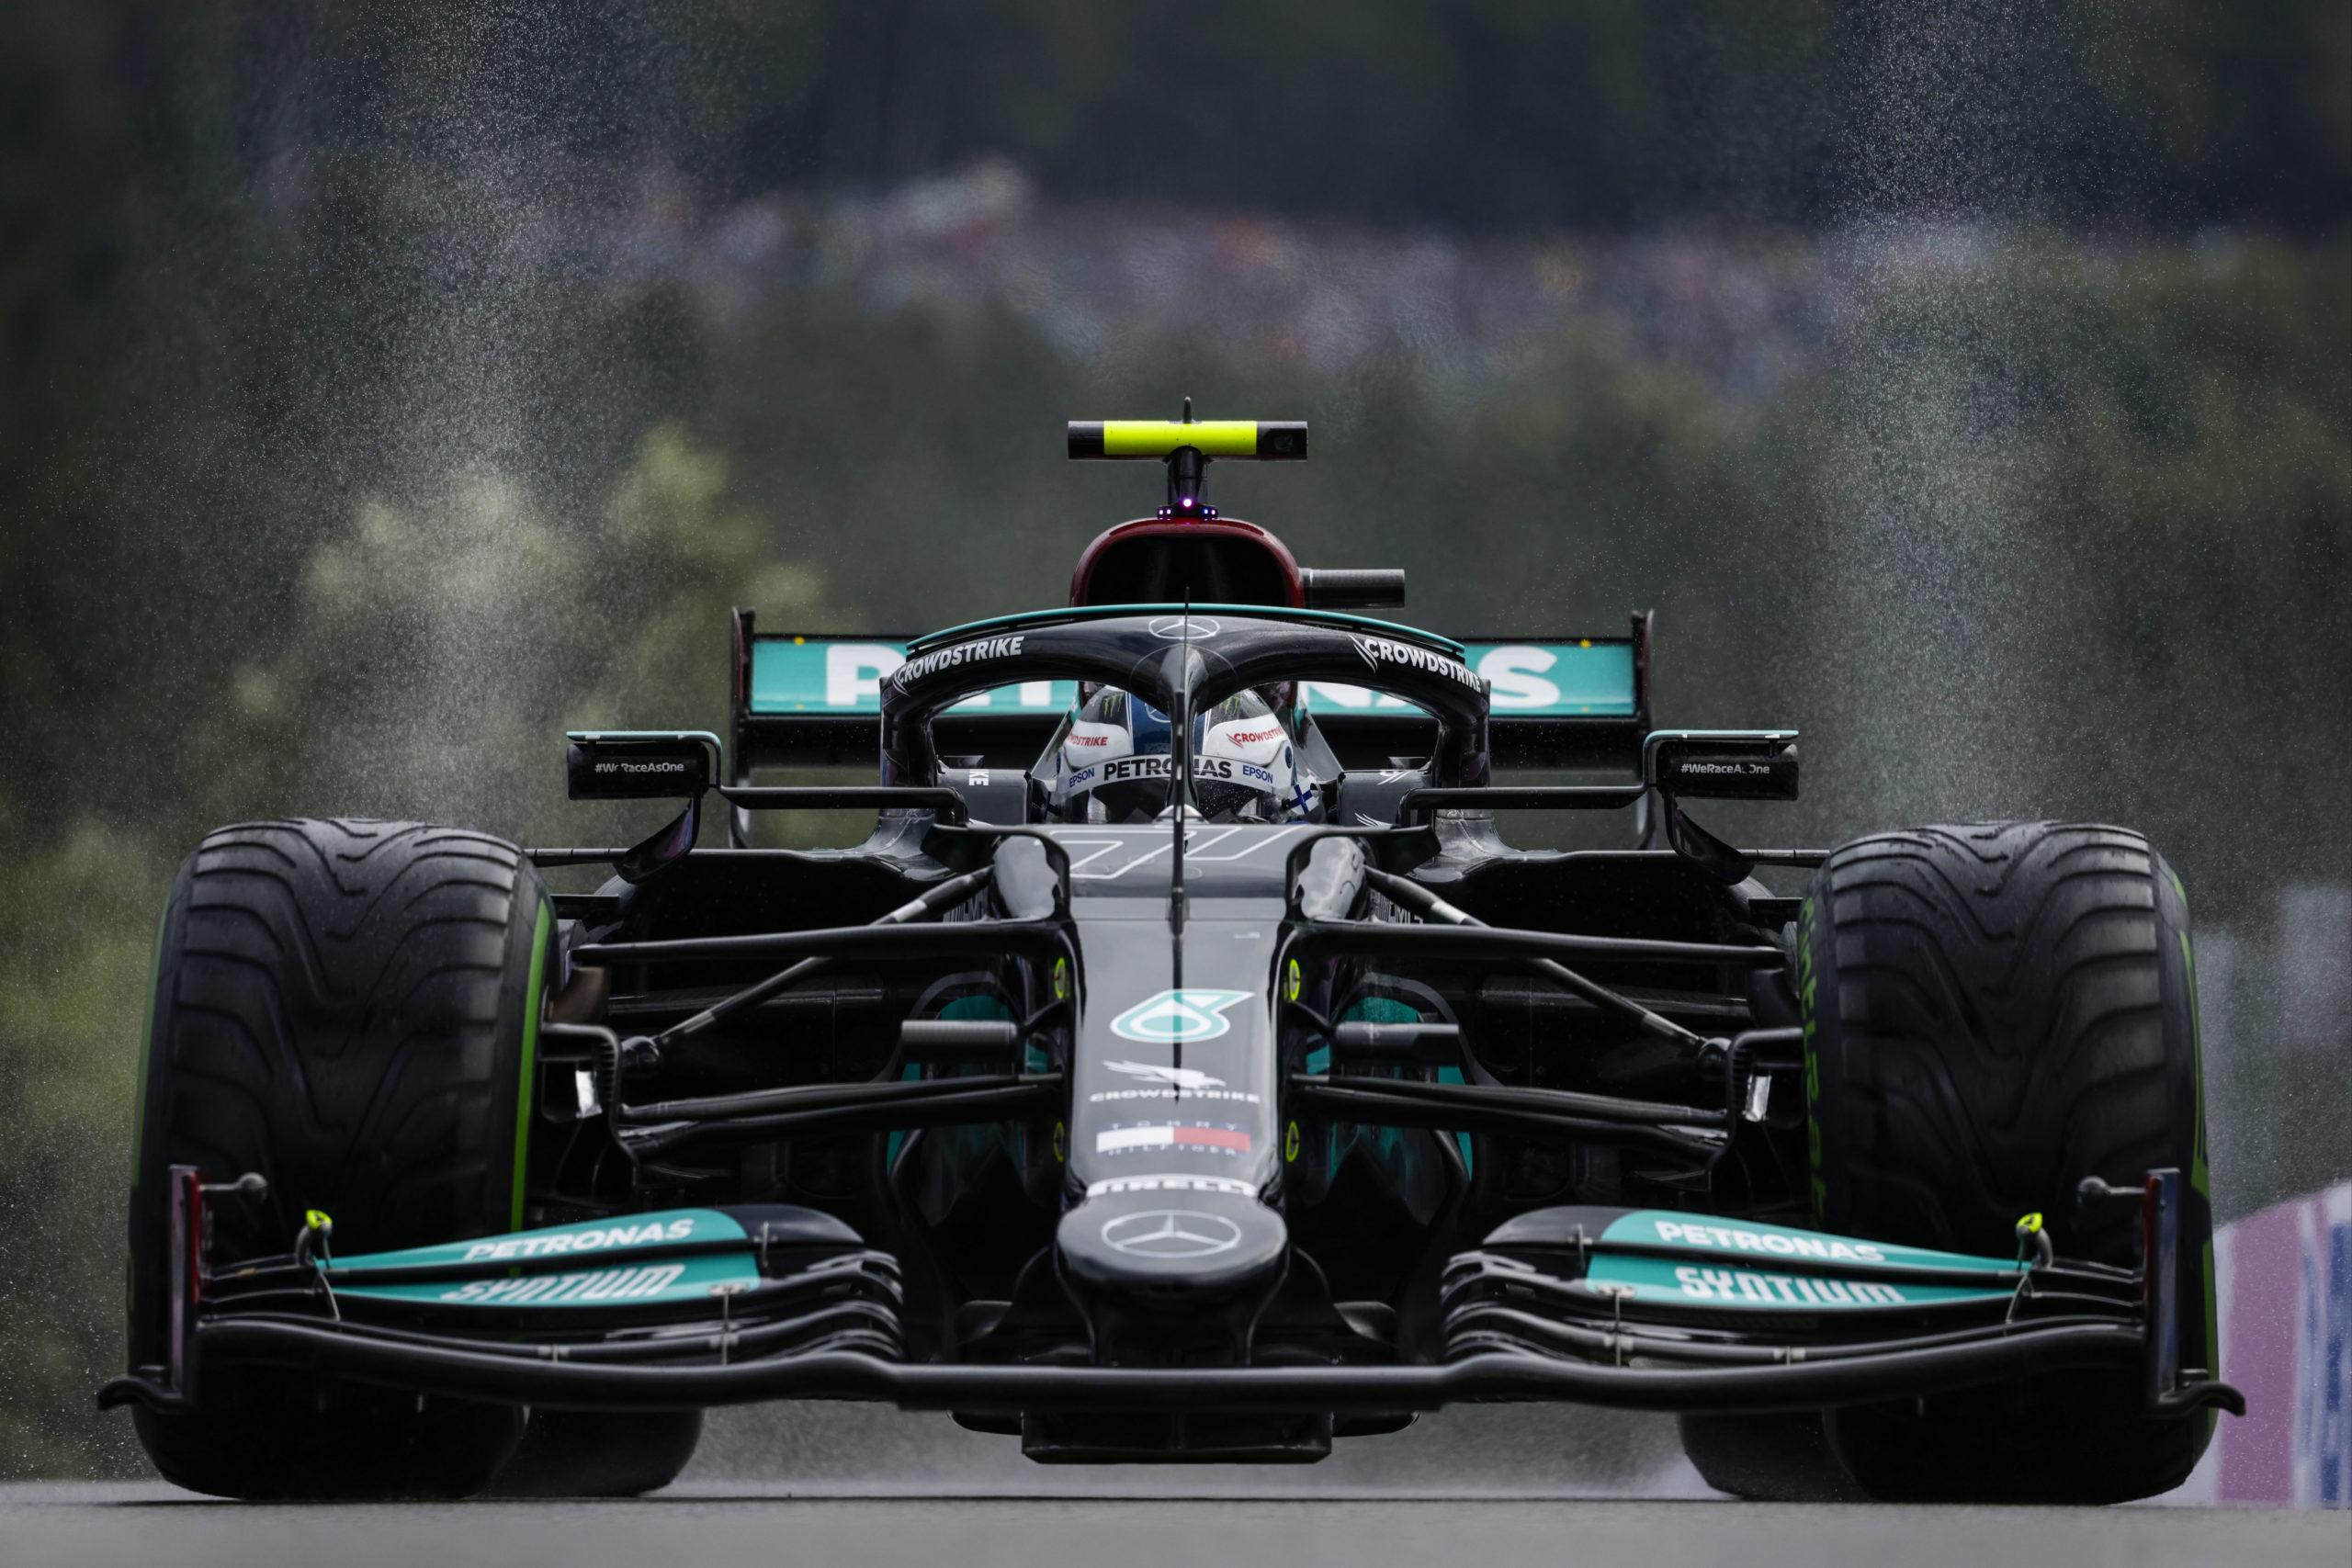 Valtteri Bottas, Mercedes, 2021 Belgian Grand Prix, Saturday - LAT Images